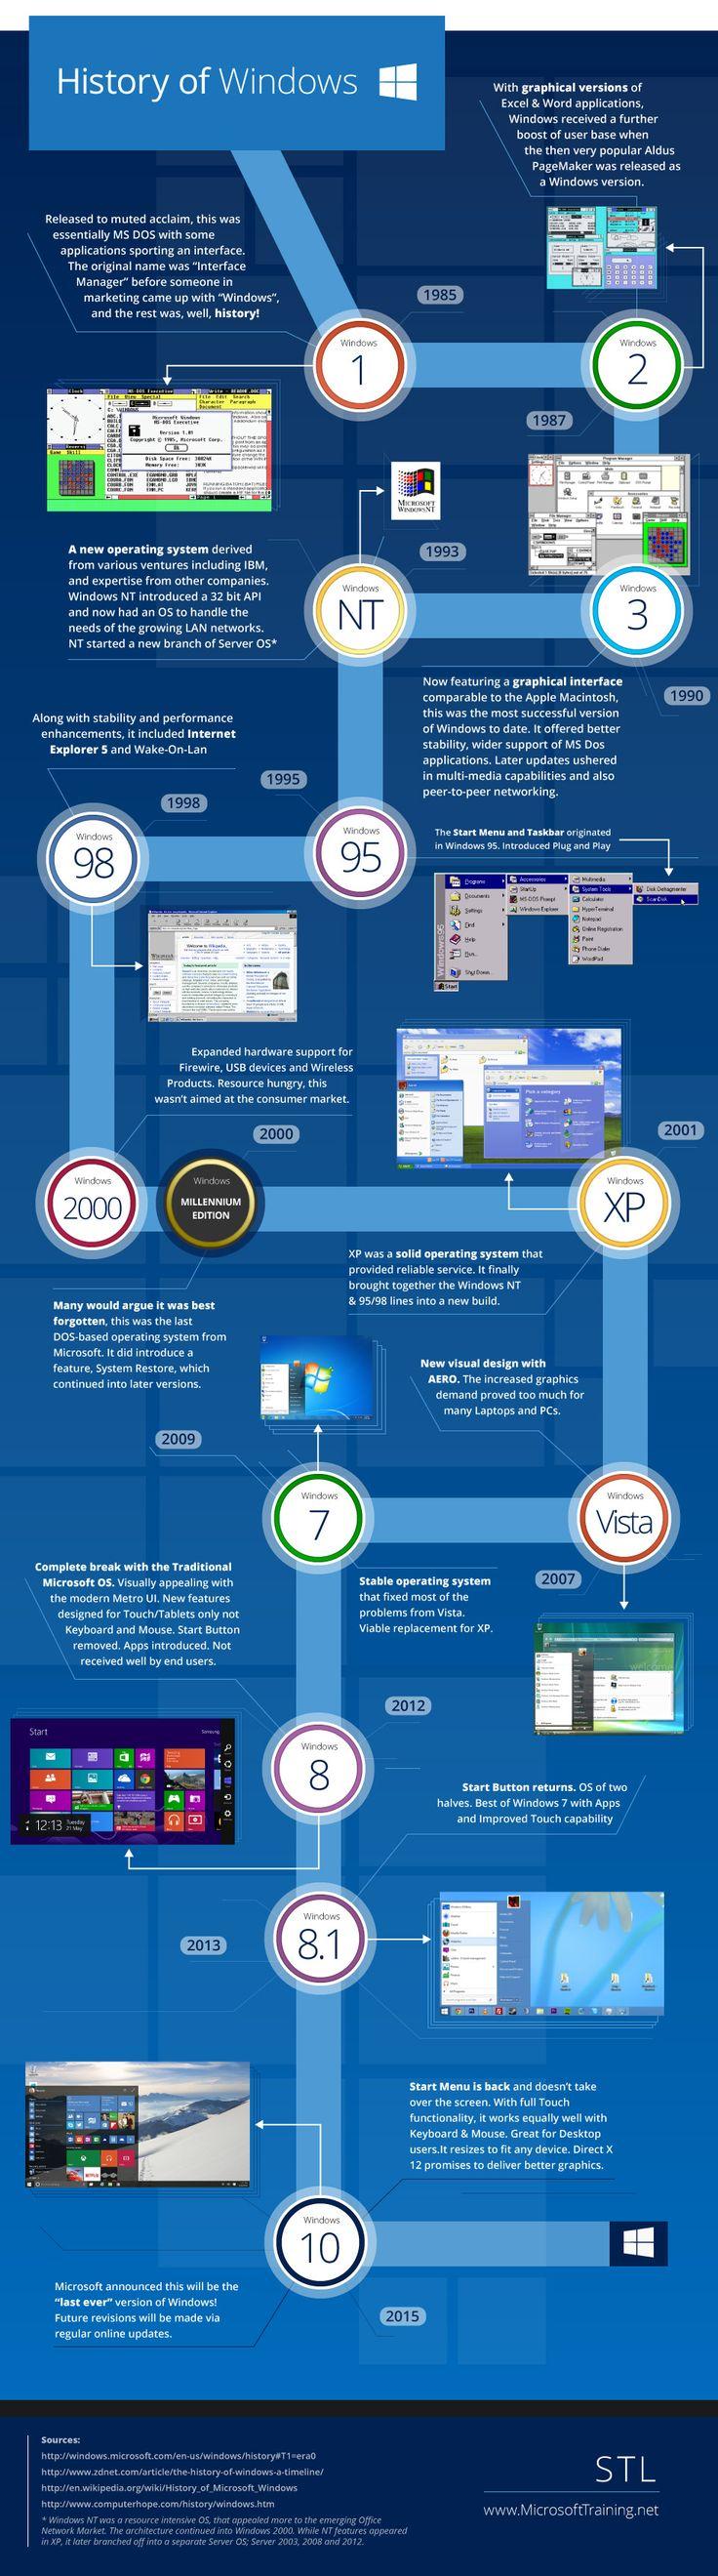 The History of Windows